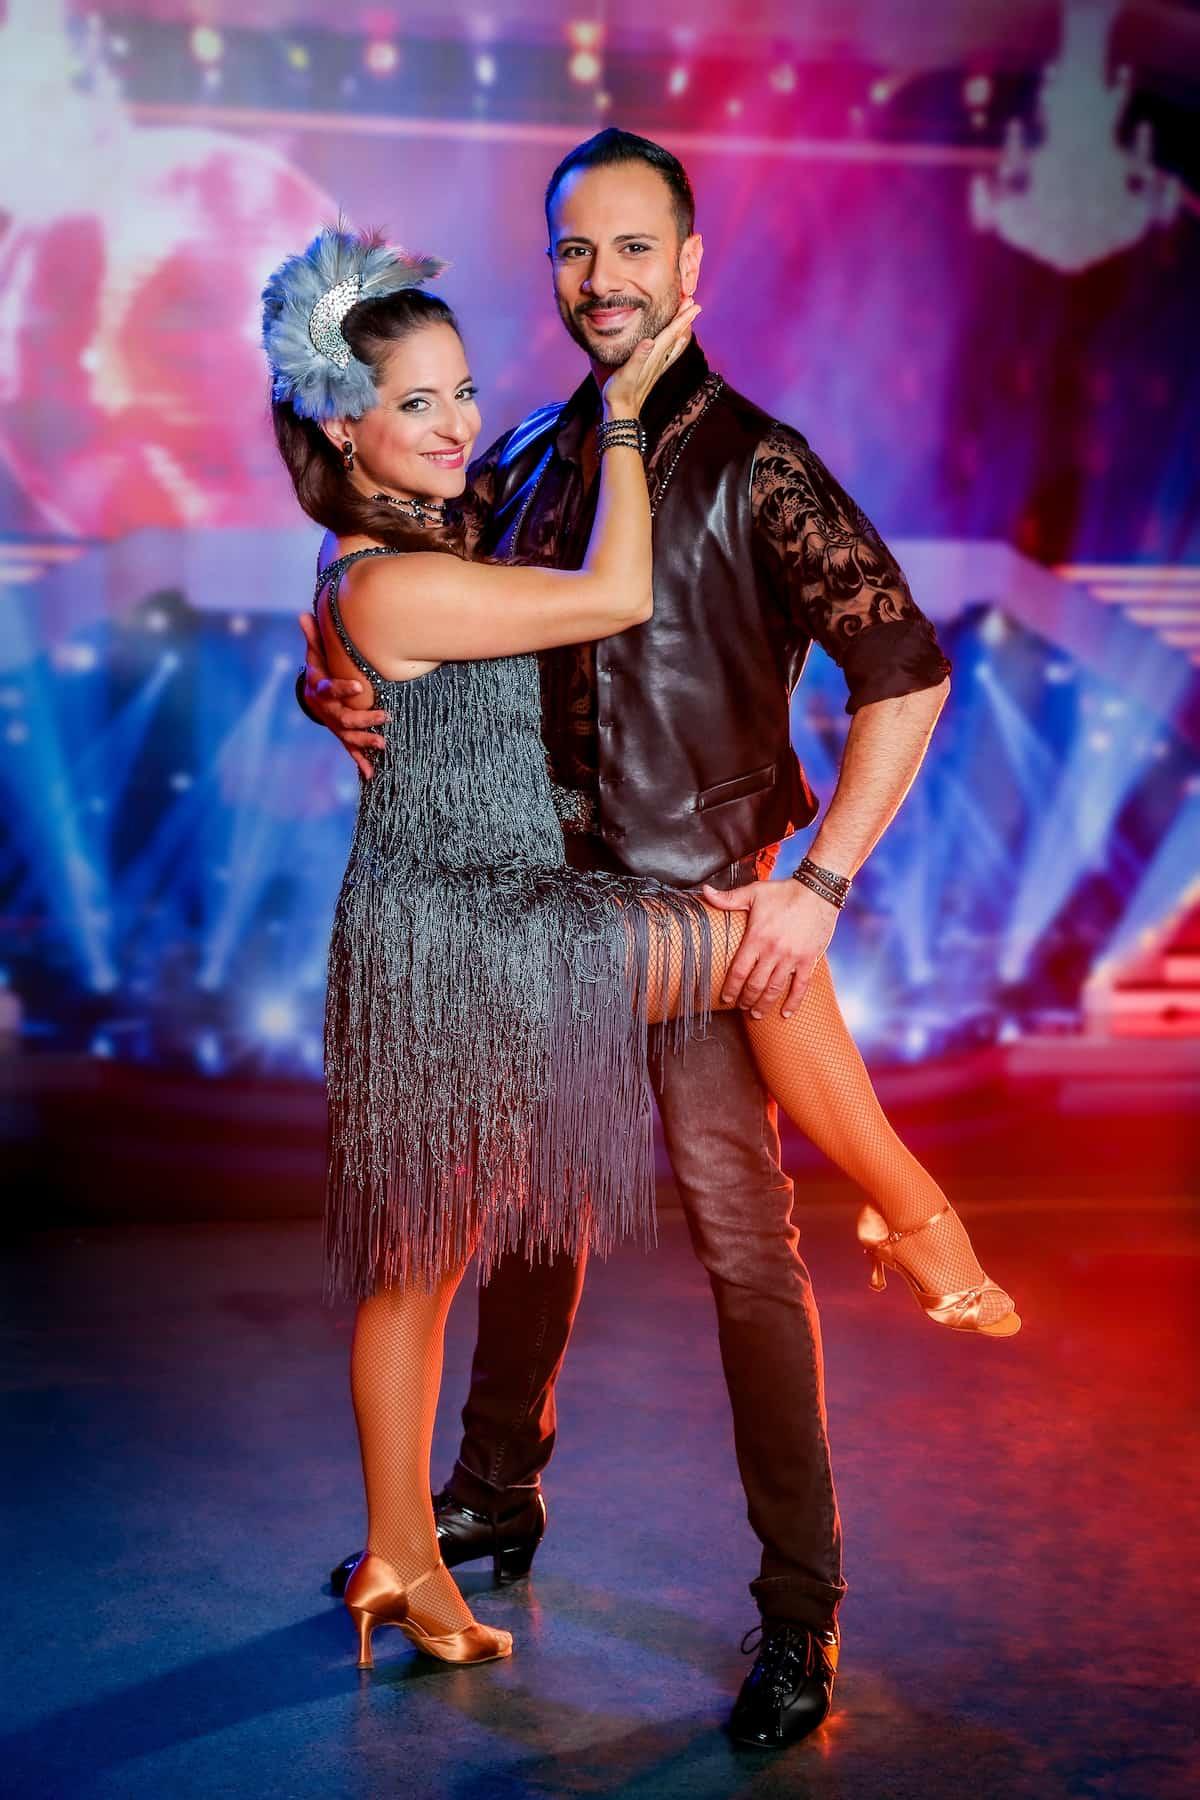 Caroline Athanasiadis und Danilo Campisi - Dancing Stars 8.10.2021